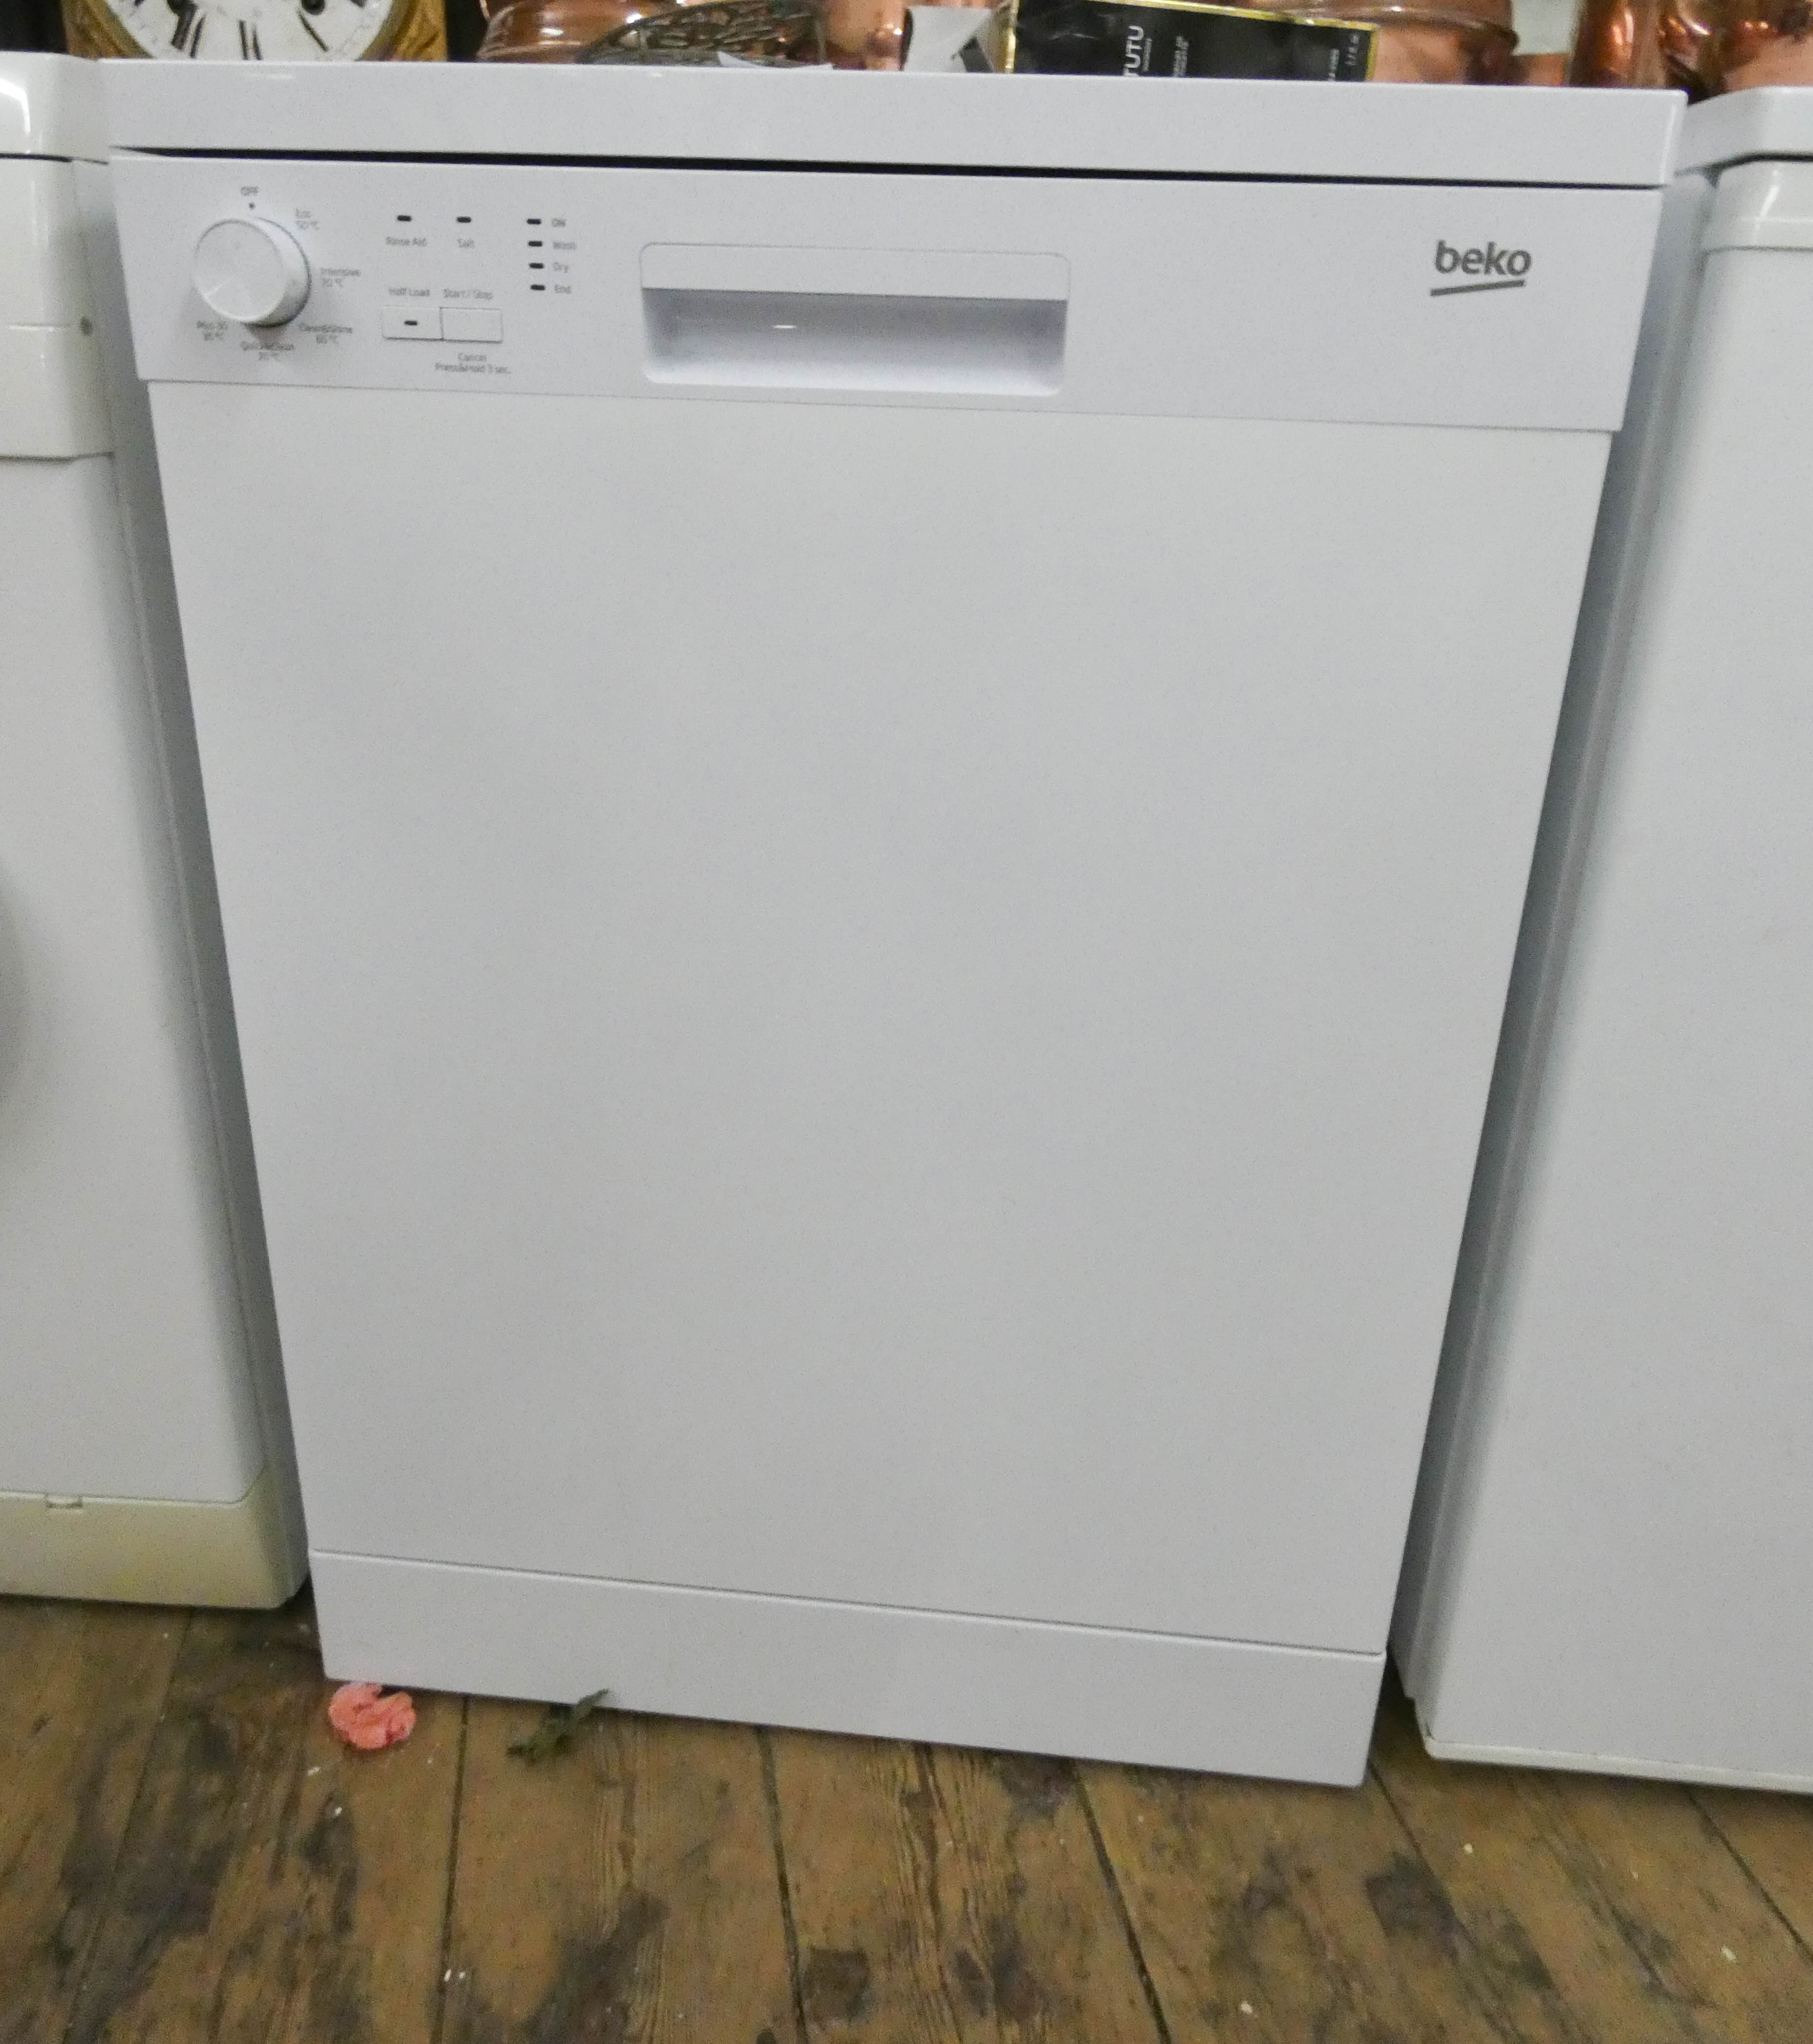 Lot 11 - A Beko dishwasher